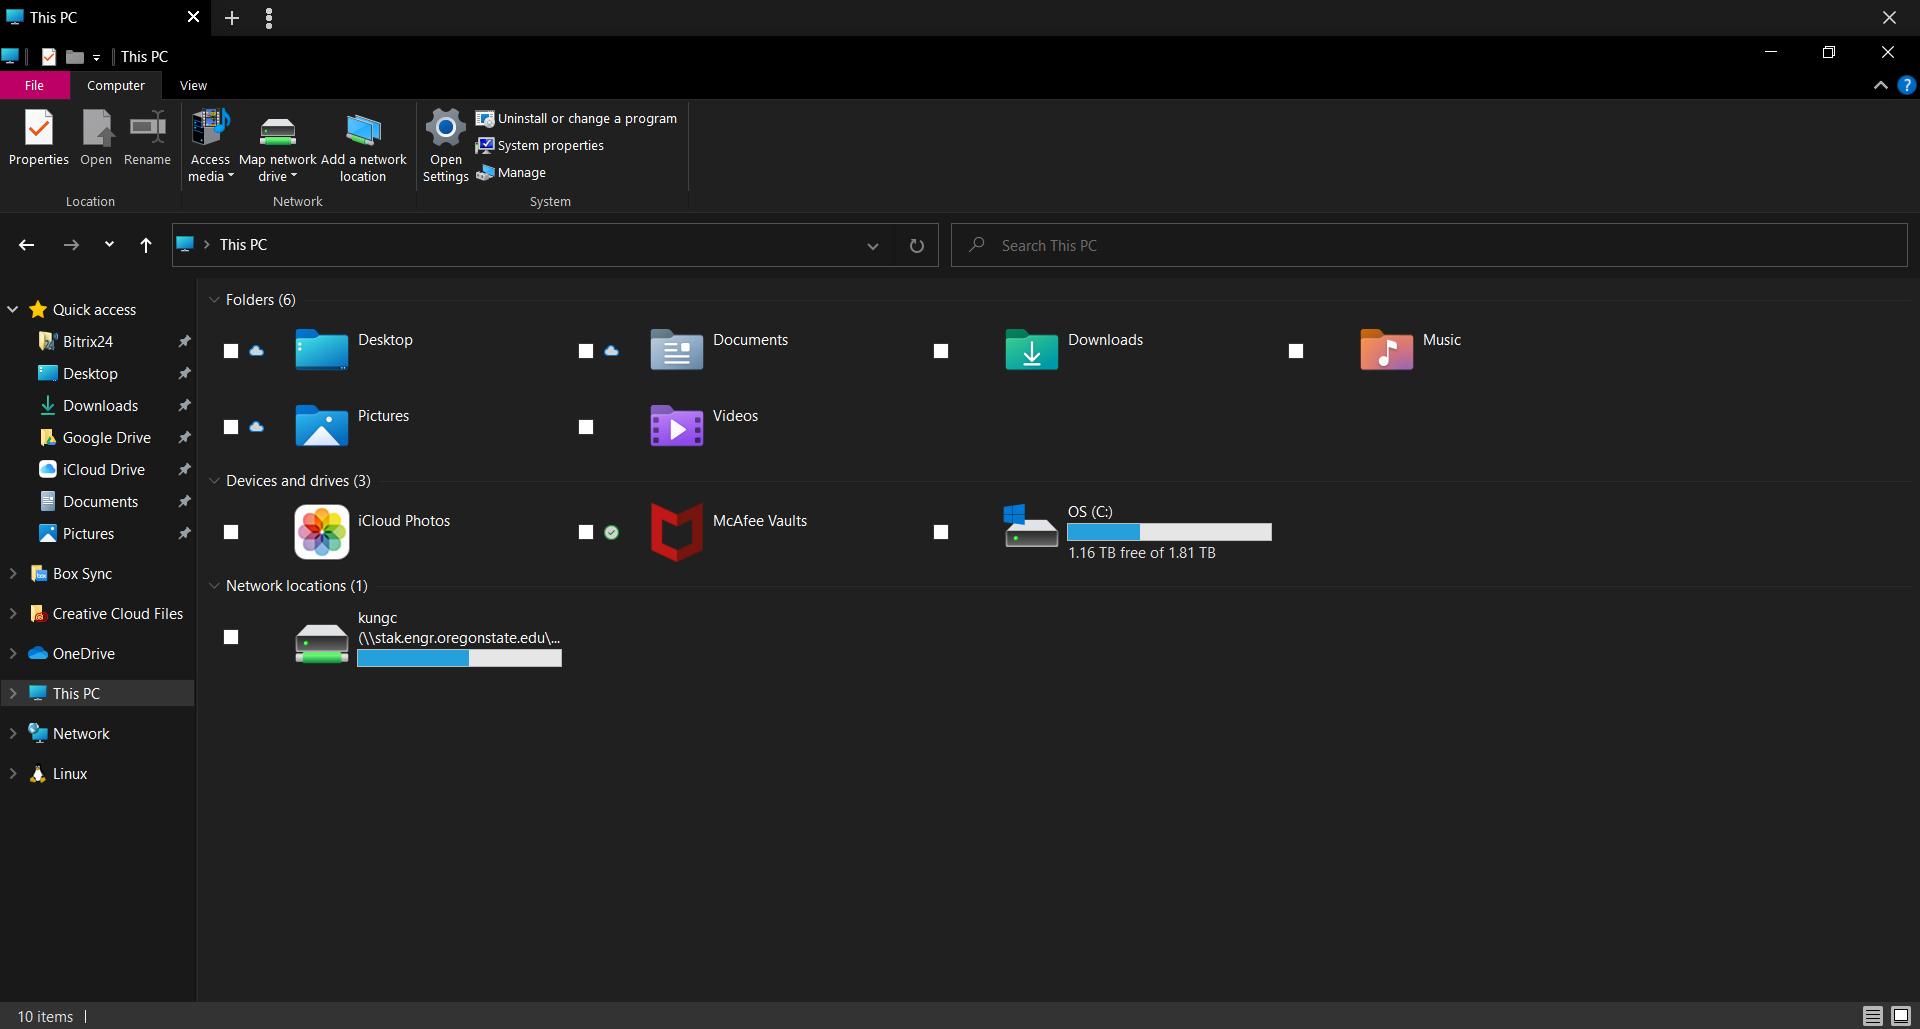 https://cloud-fhd7udwtz-hack-club-bot.vercel.app/0new_windows_icon.png